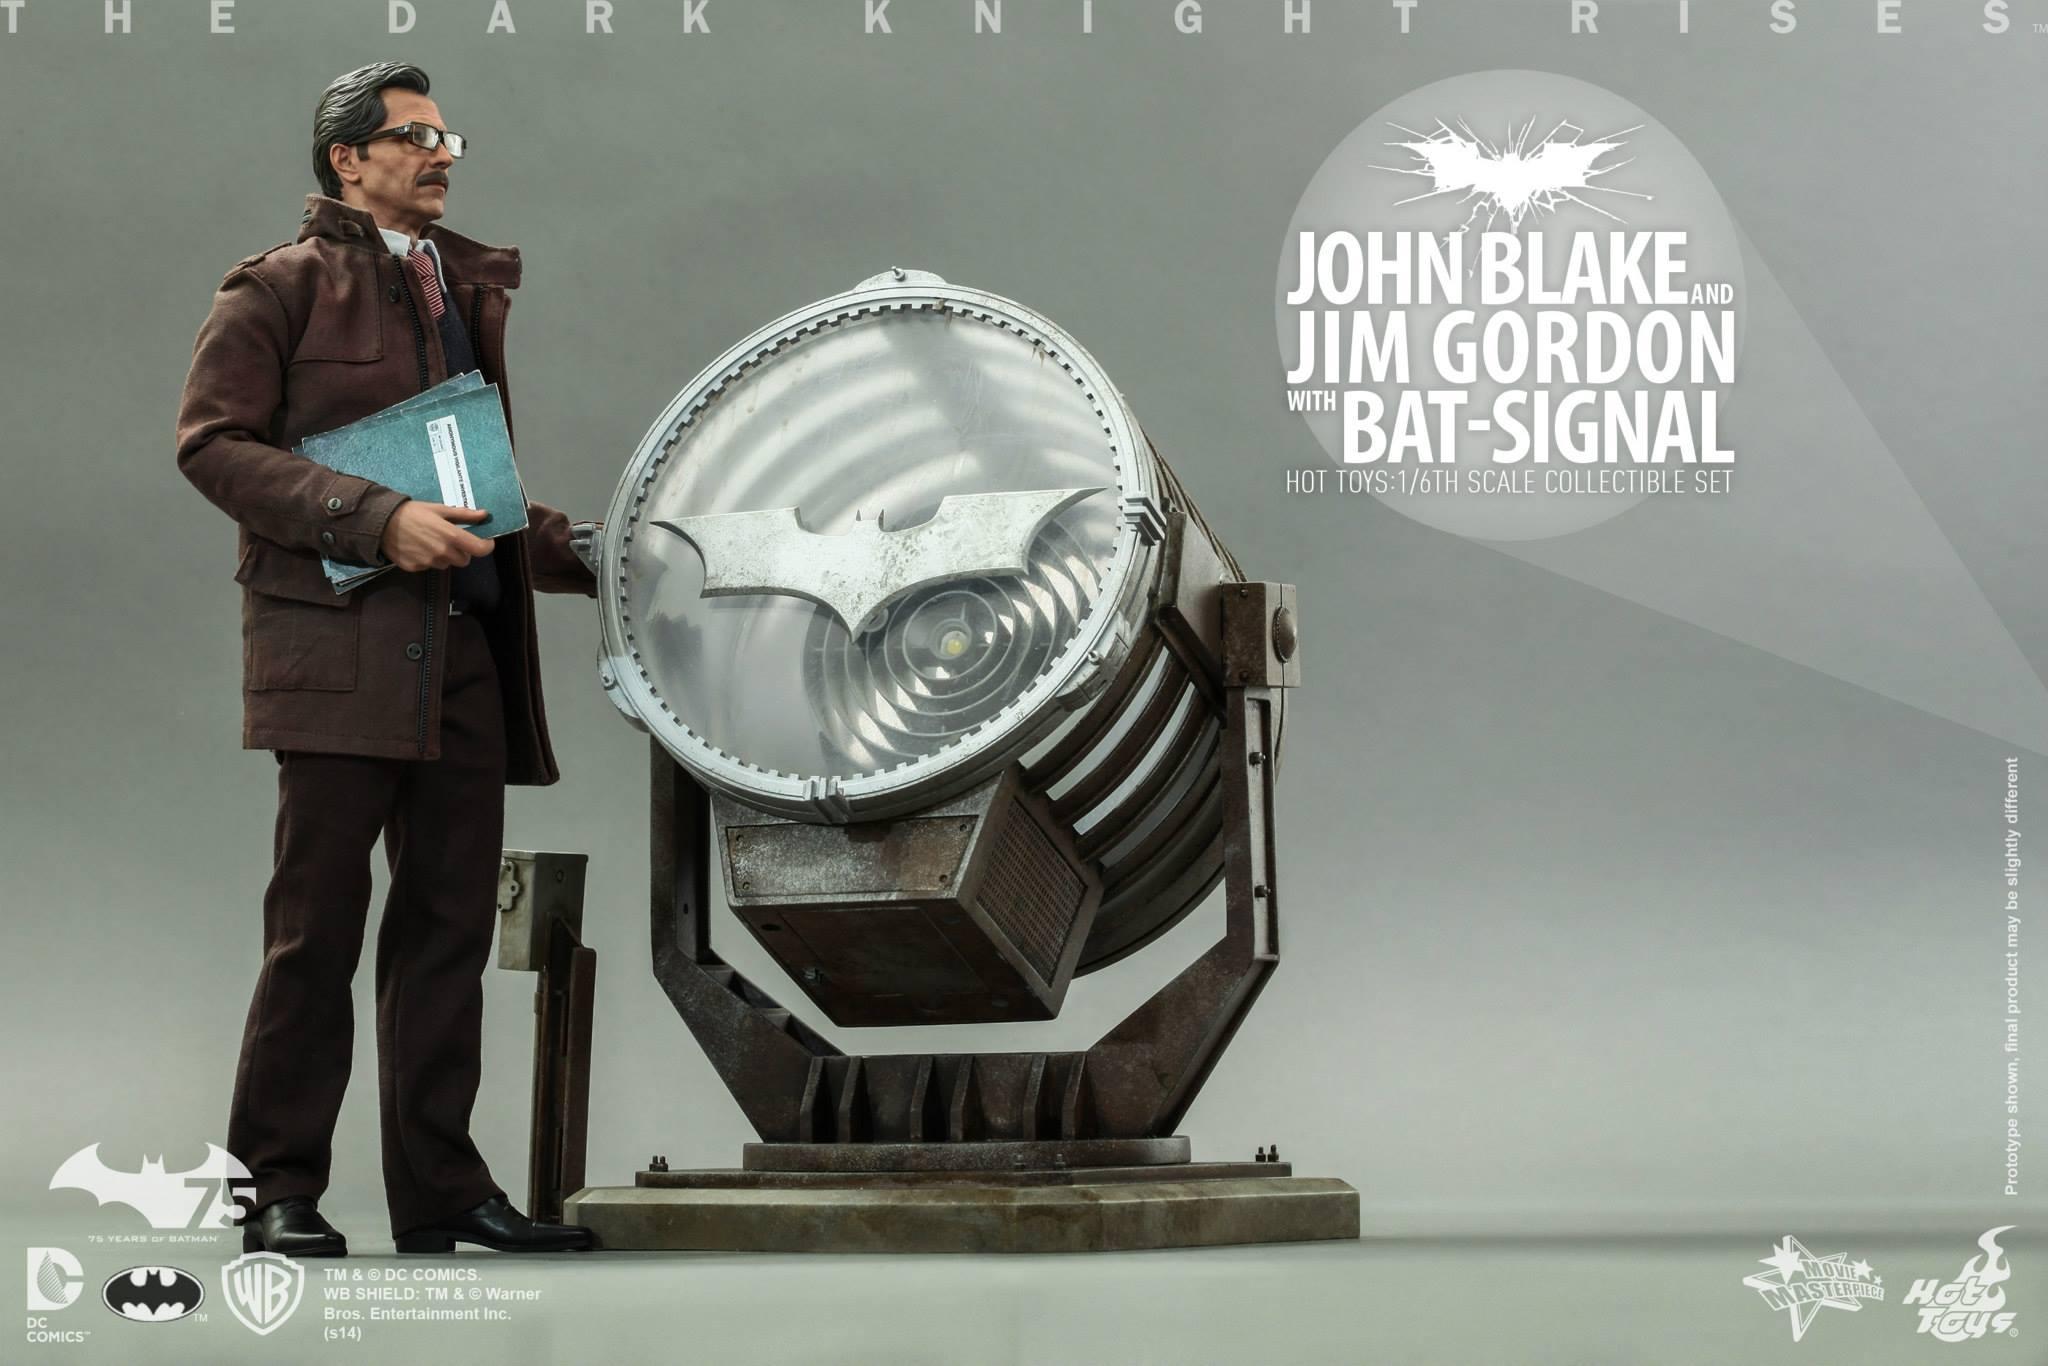 THE DARK KNIGHT RISES - Lt. JIM GORDON & JOHN BLAKE w/BATSIGNAL 739943106